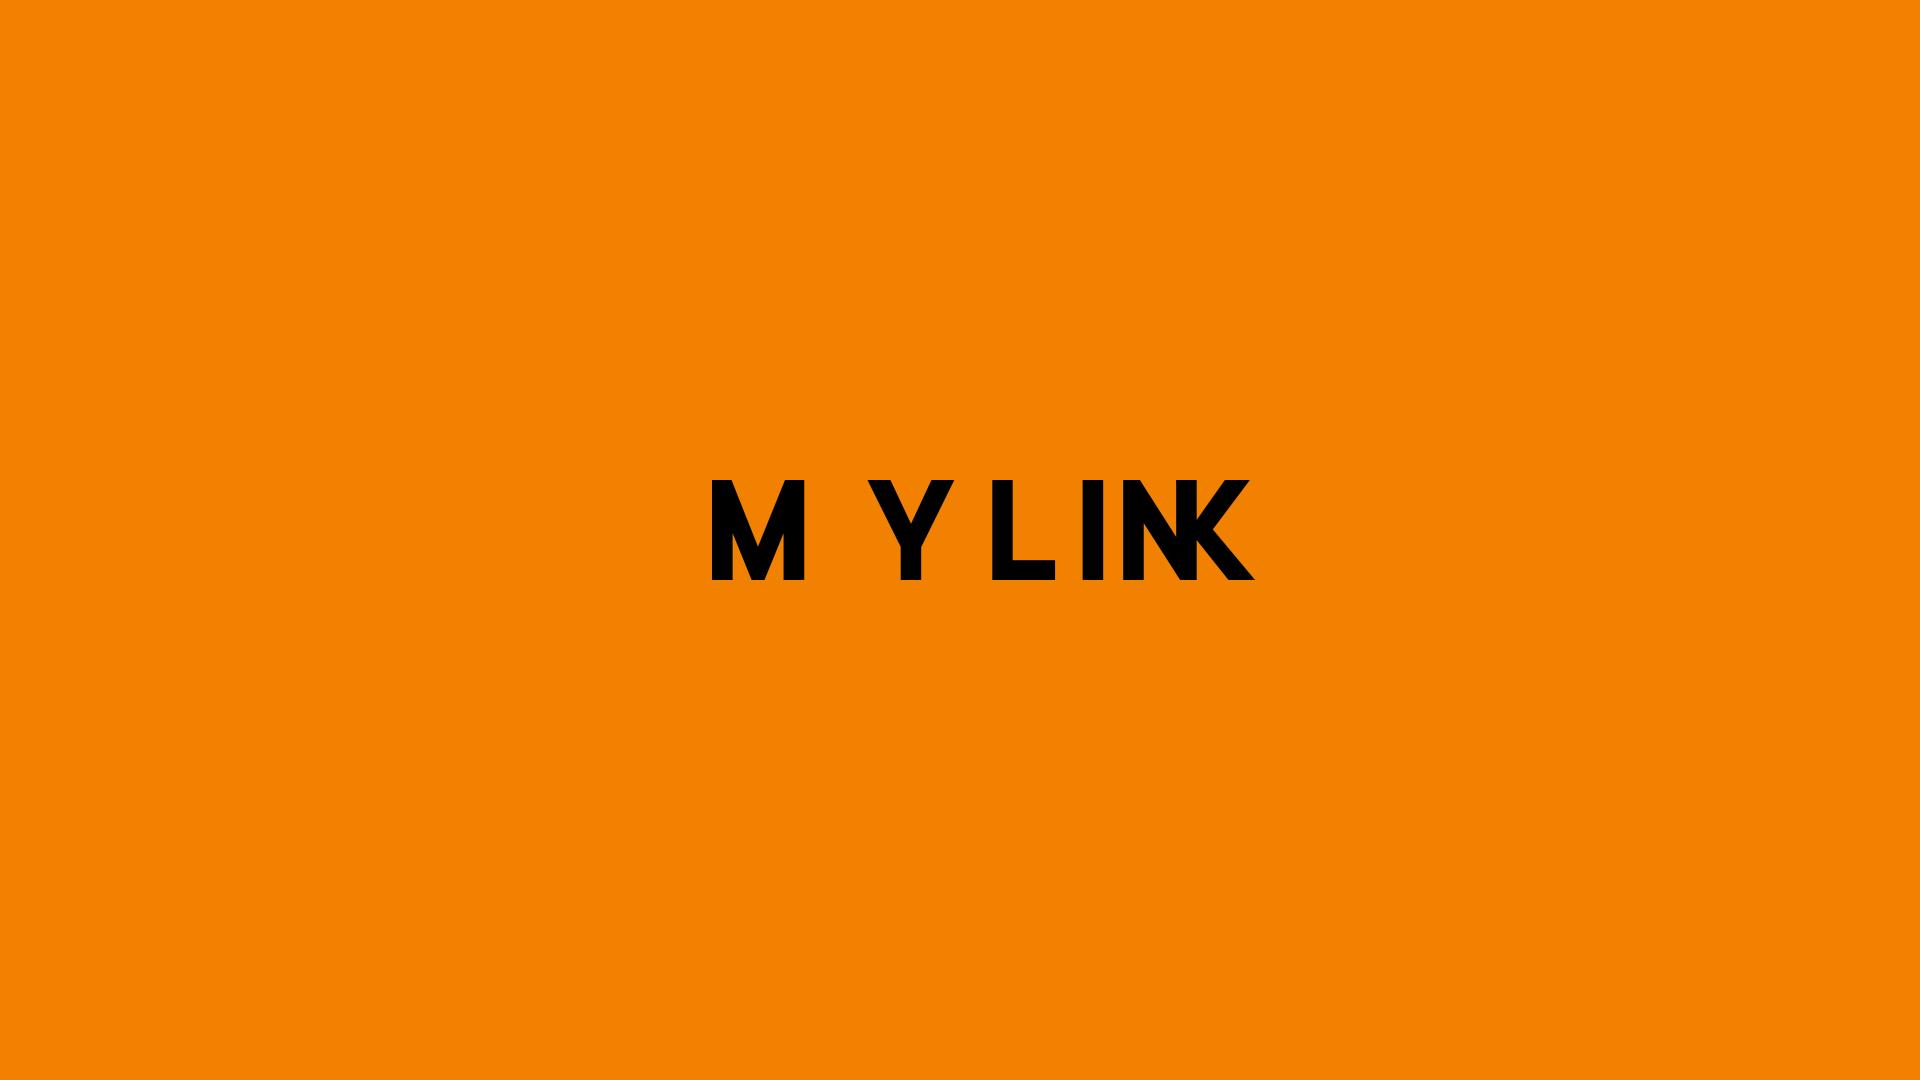 mylink_logo_design